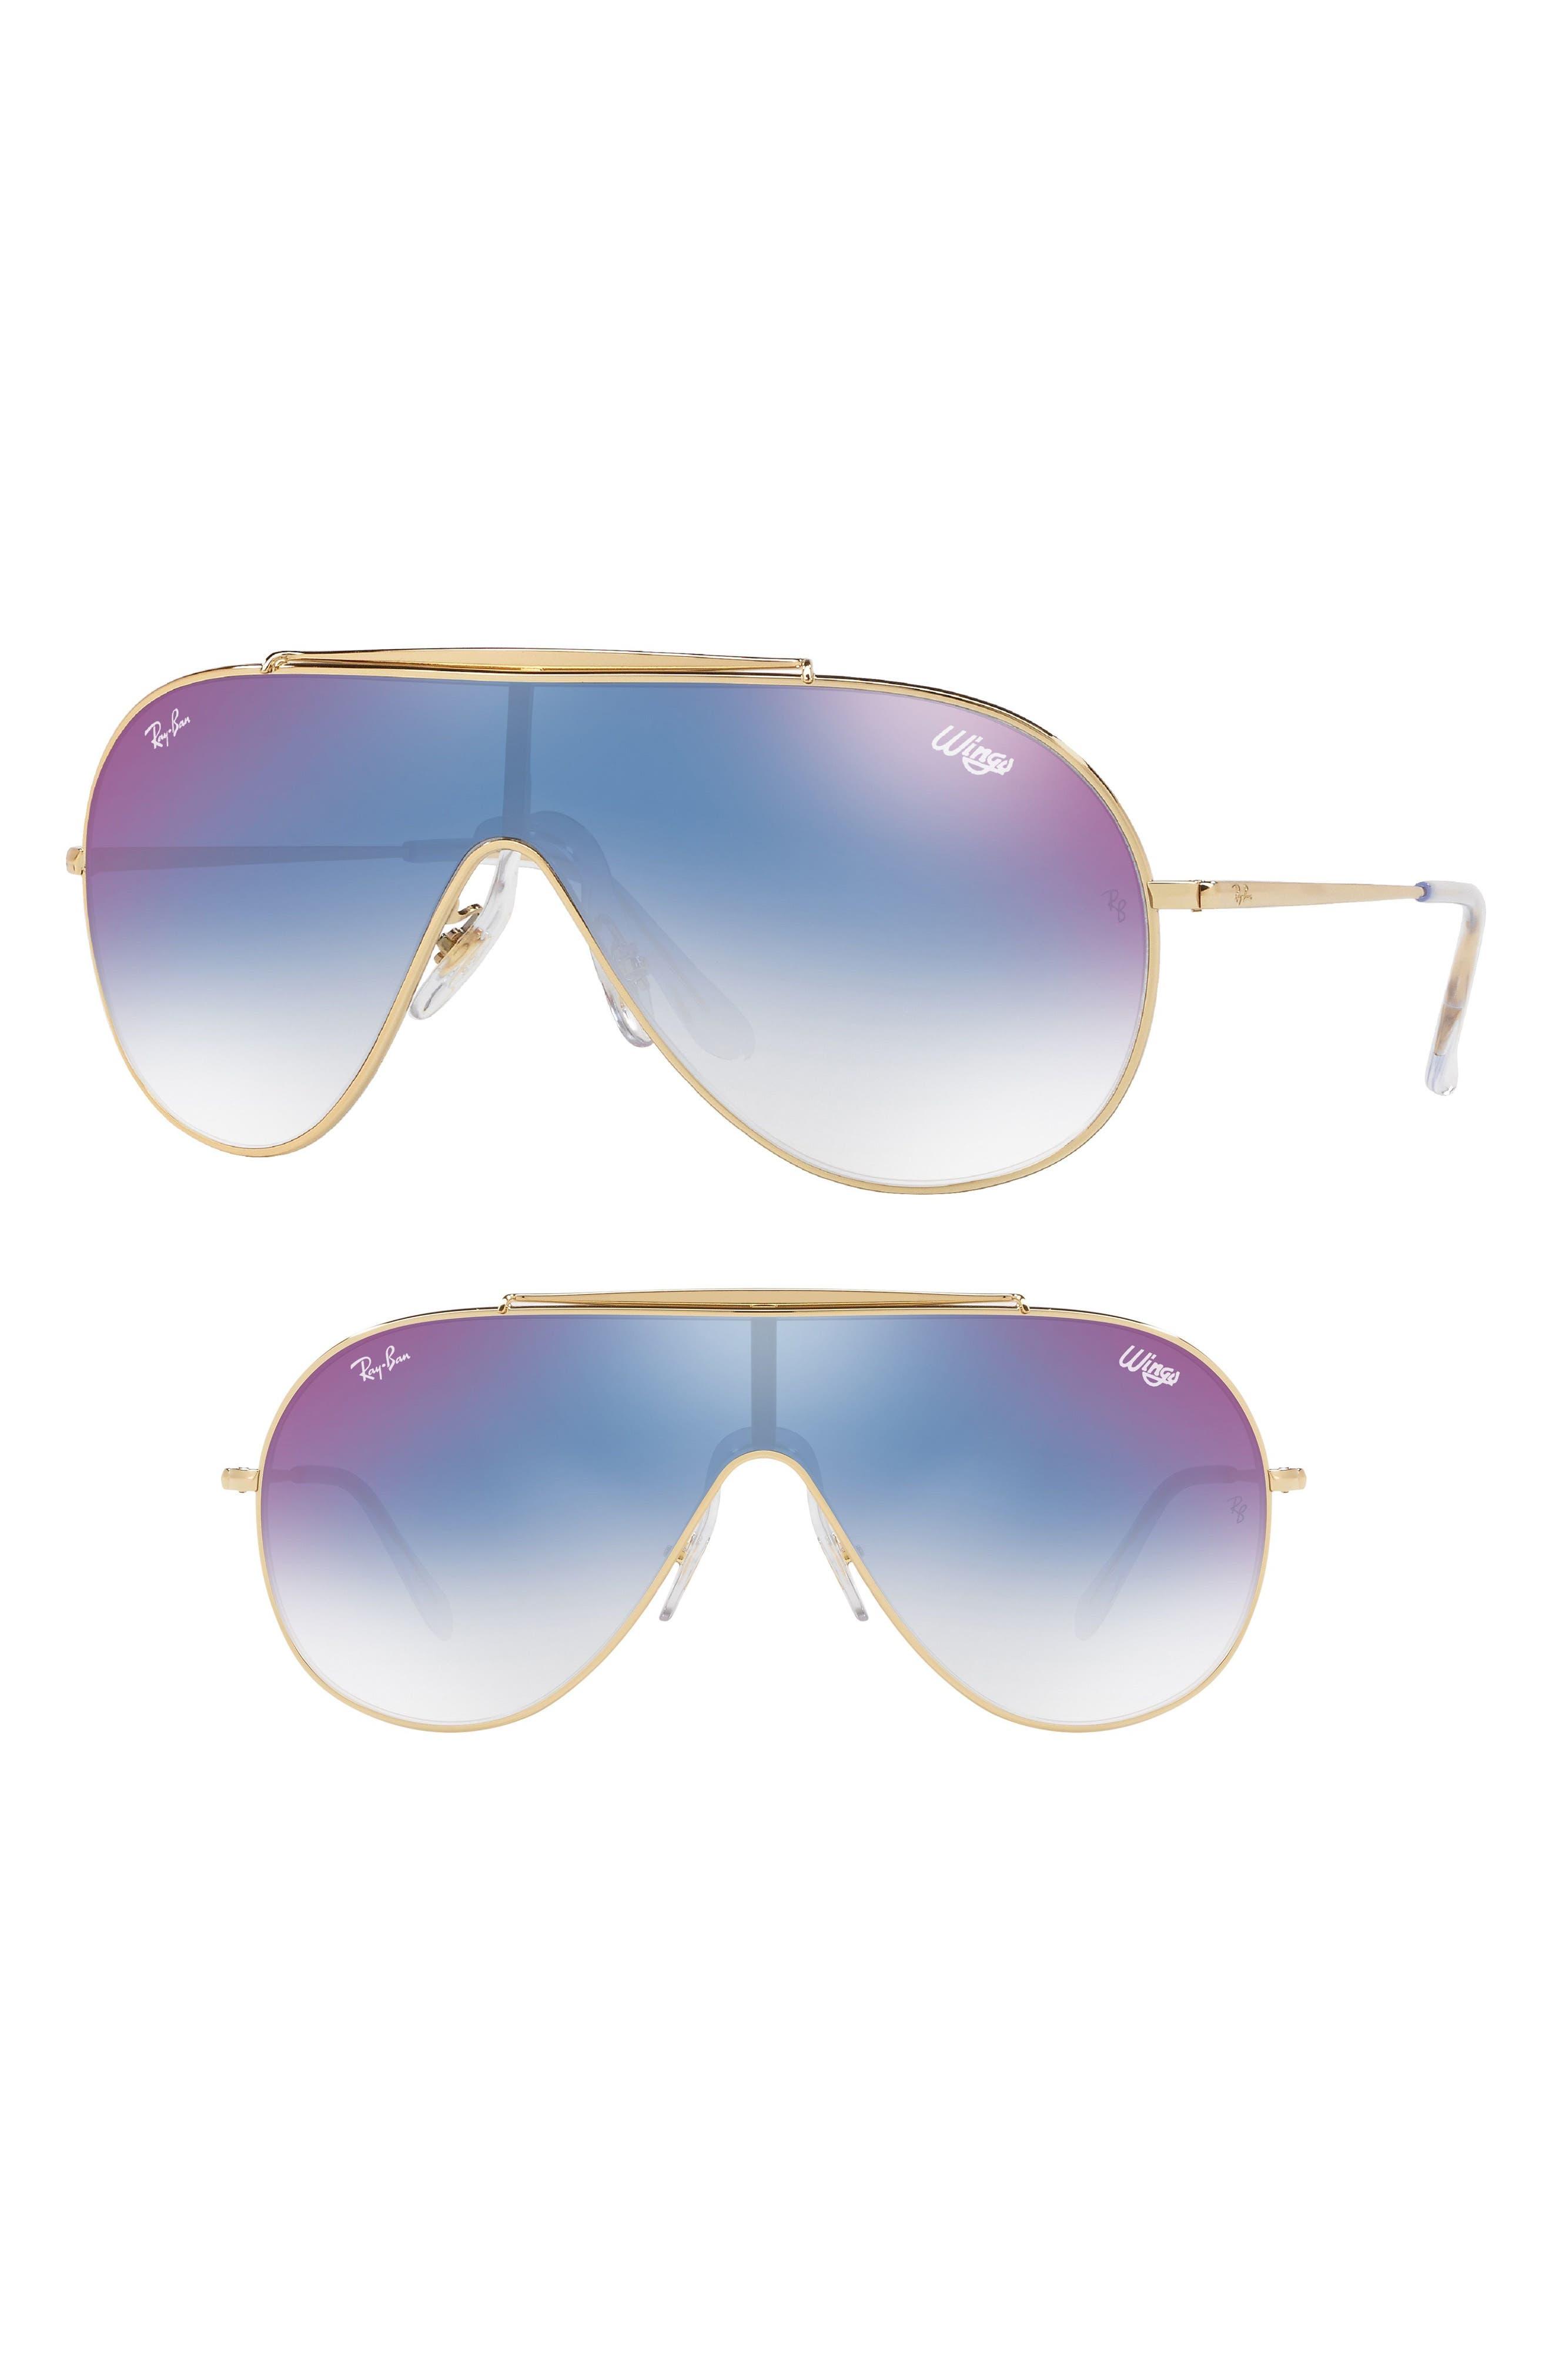 133mm Shield Sunglasses,                         Main,                         color, Purple/ Blue Gradient Mirror